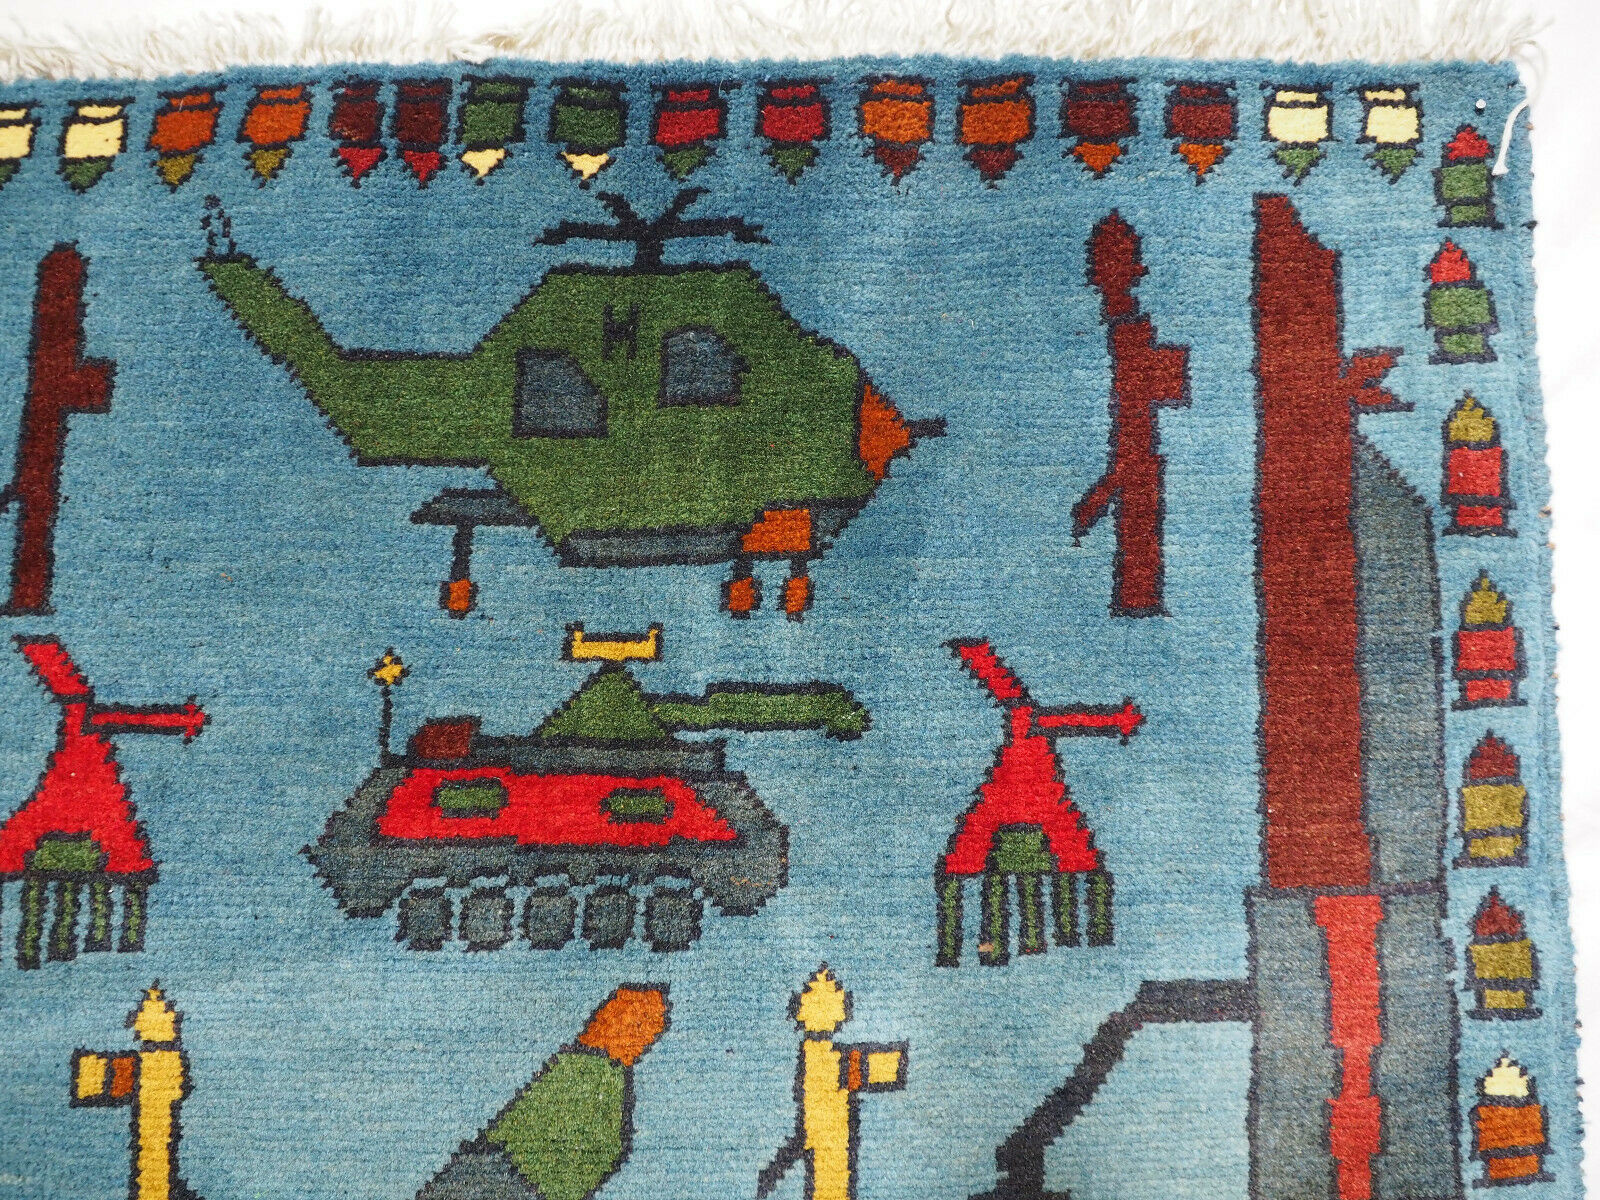 148x101 cm Afghan  Warrug Afghanistan AFG21G